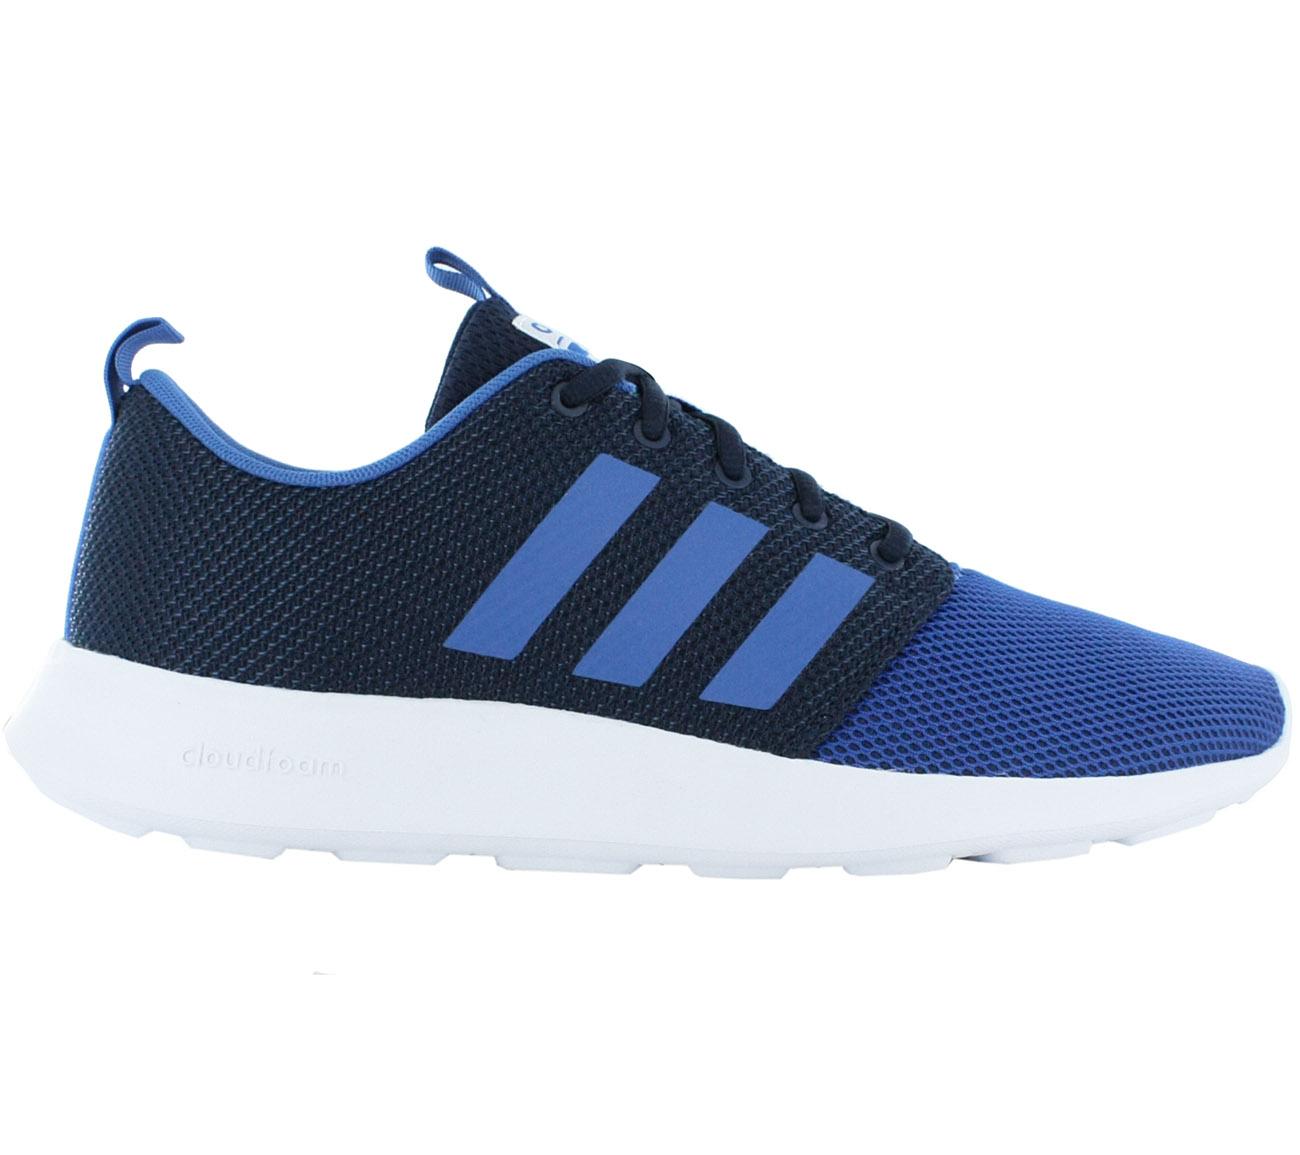 Adidas Scarpe Uomo da corsa ginnastica trainers FITNESS Cloudfoam 3